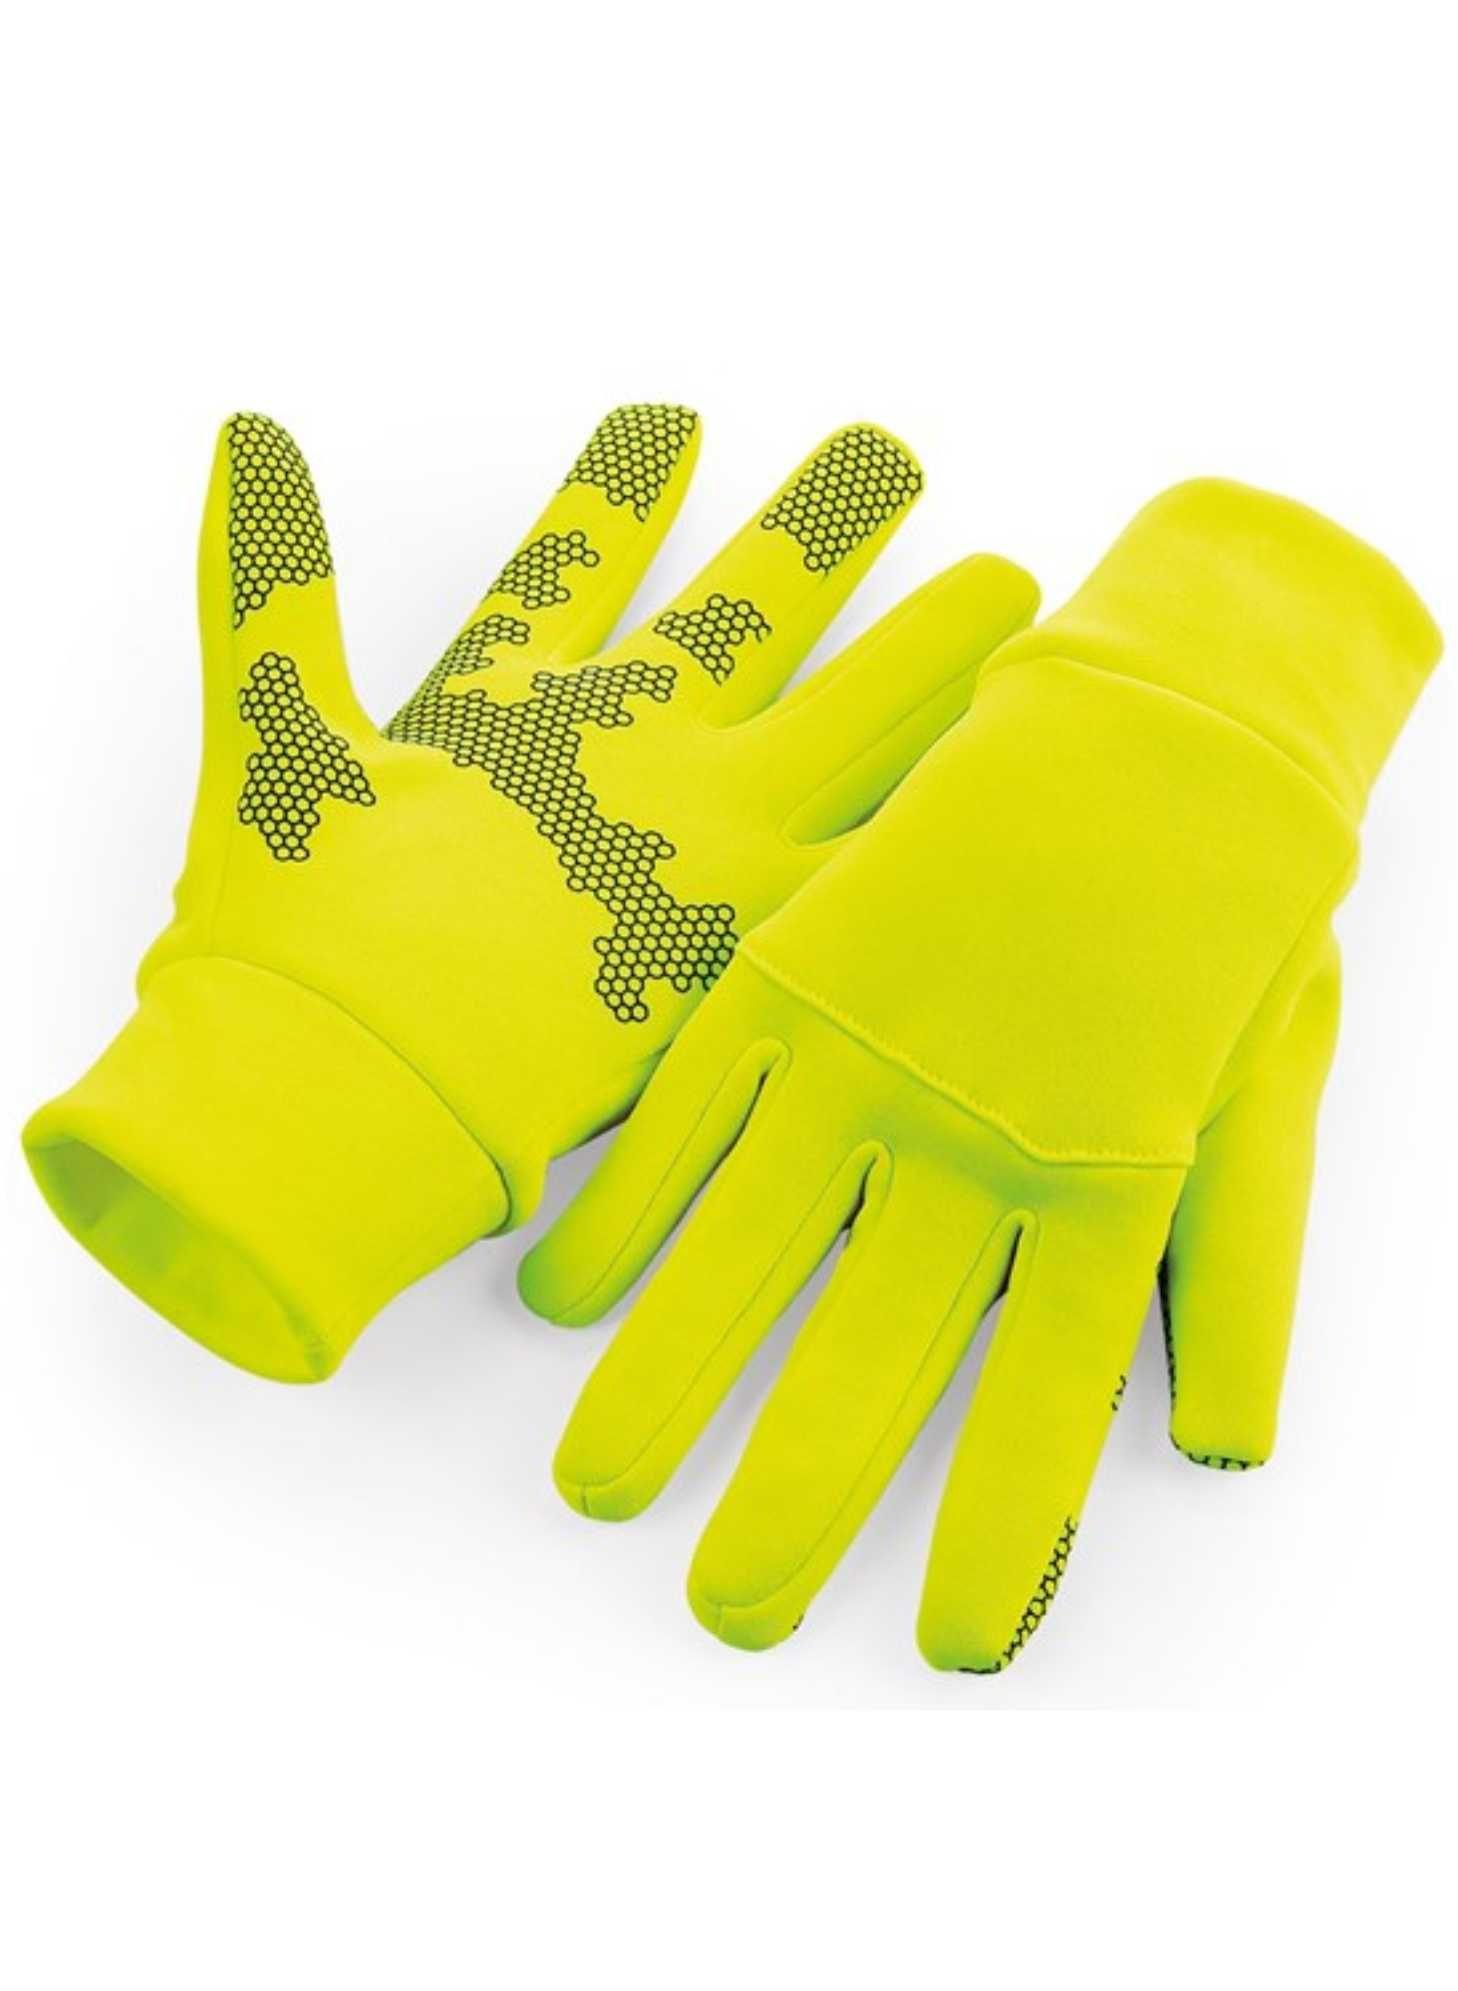 Isleham Joggers- Sports Tech Gloves